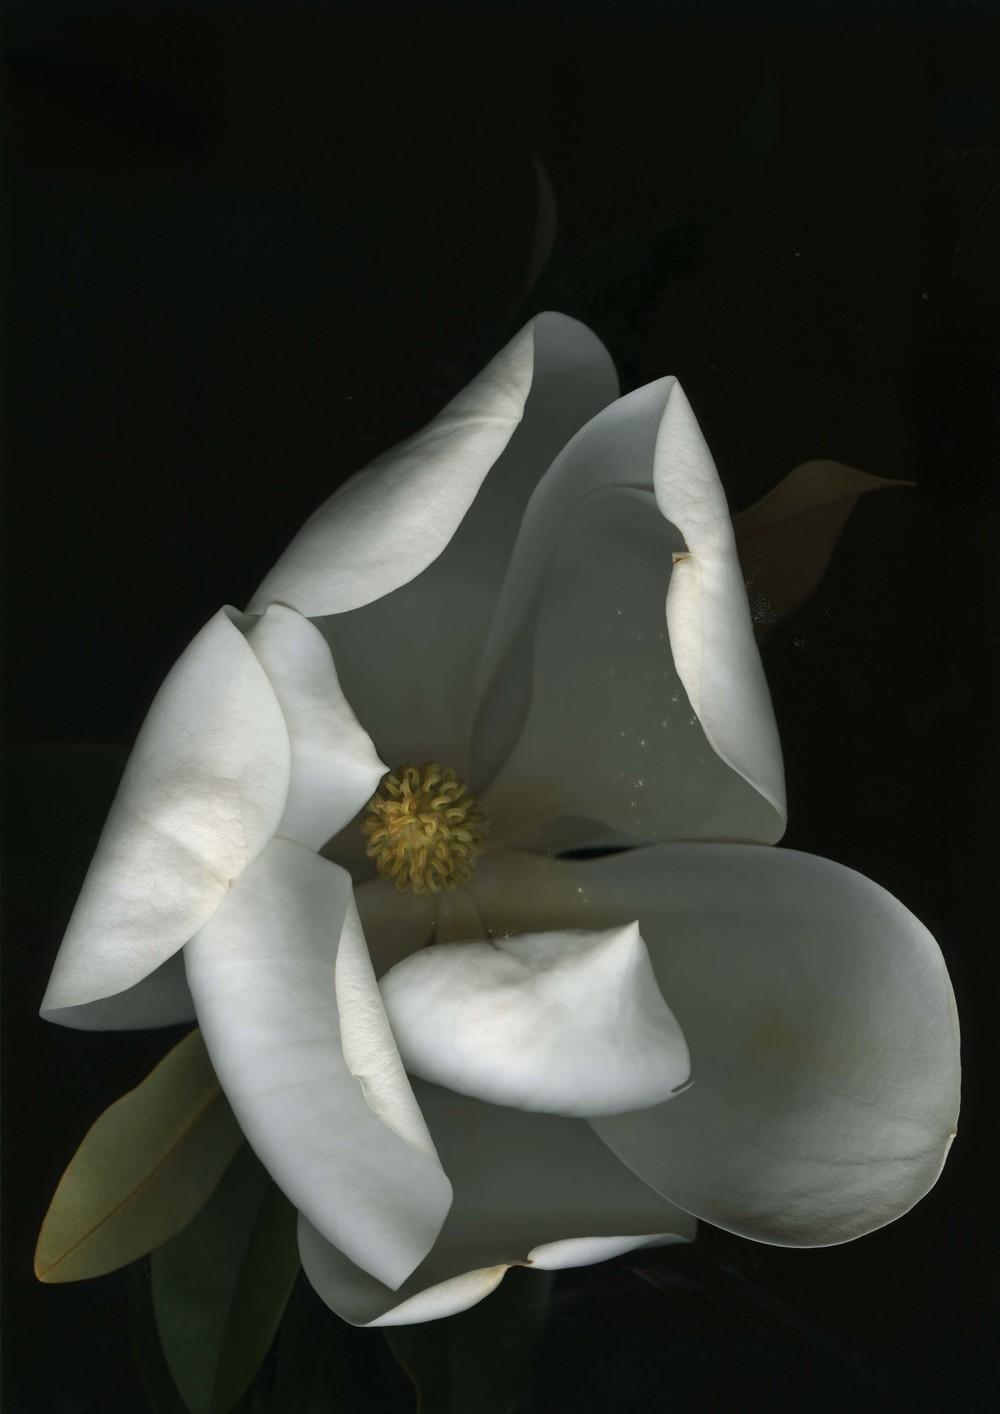 magnolia_5.jpg